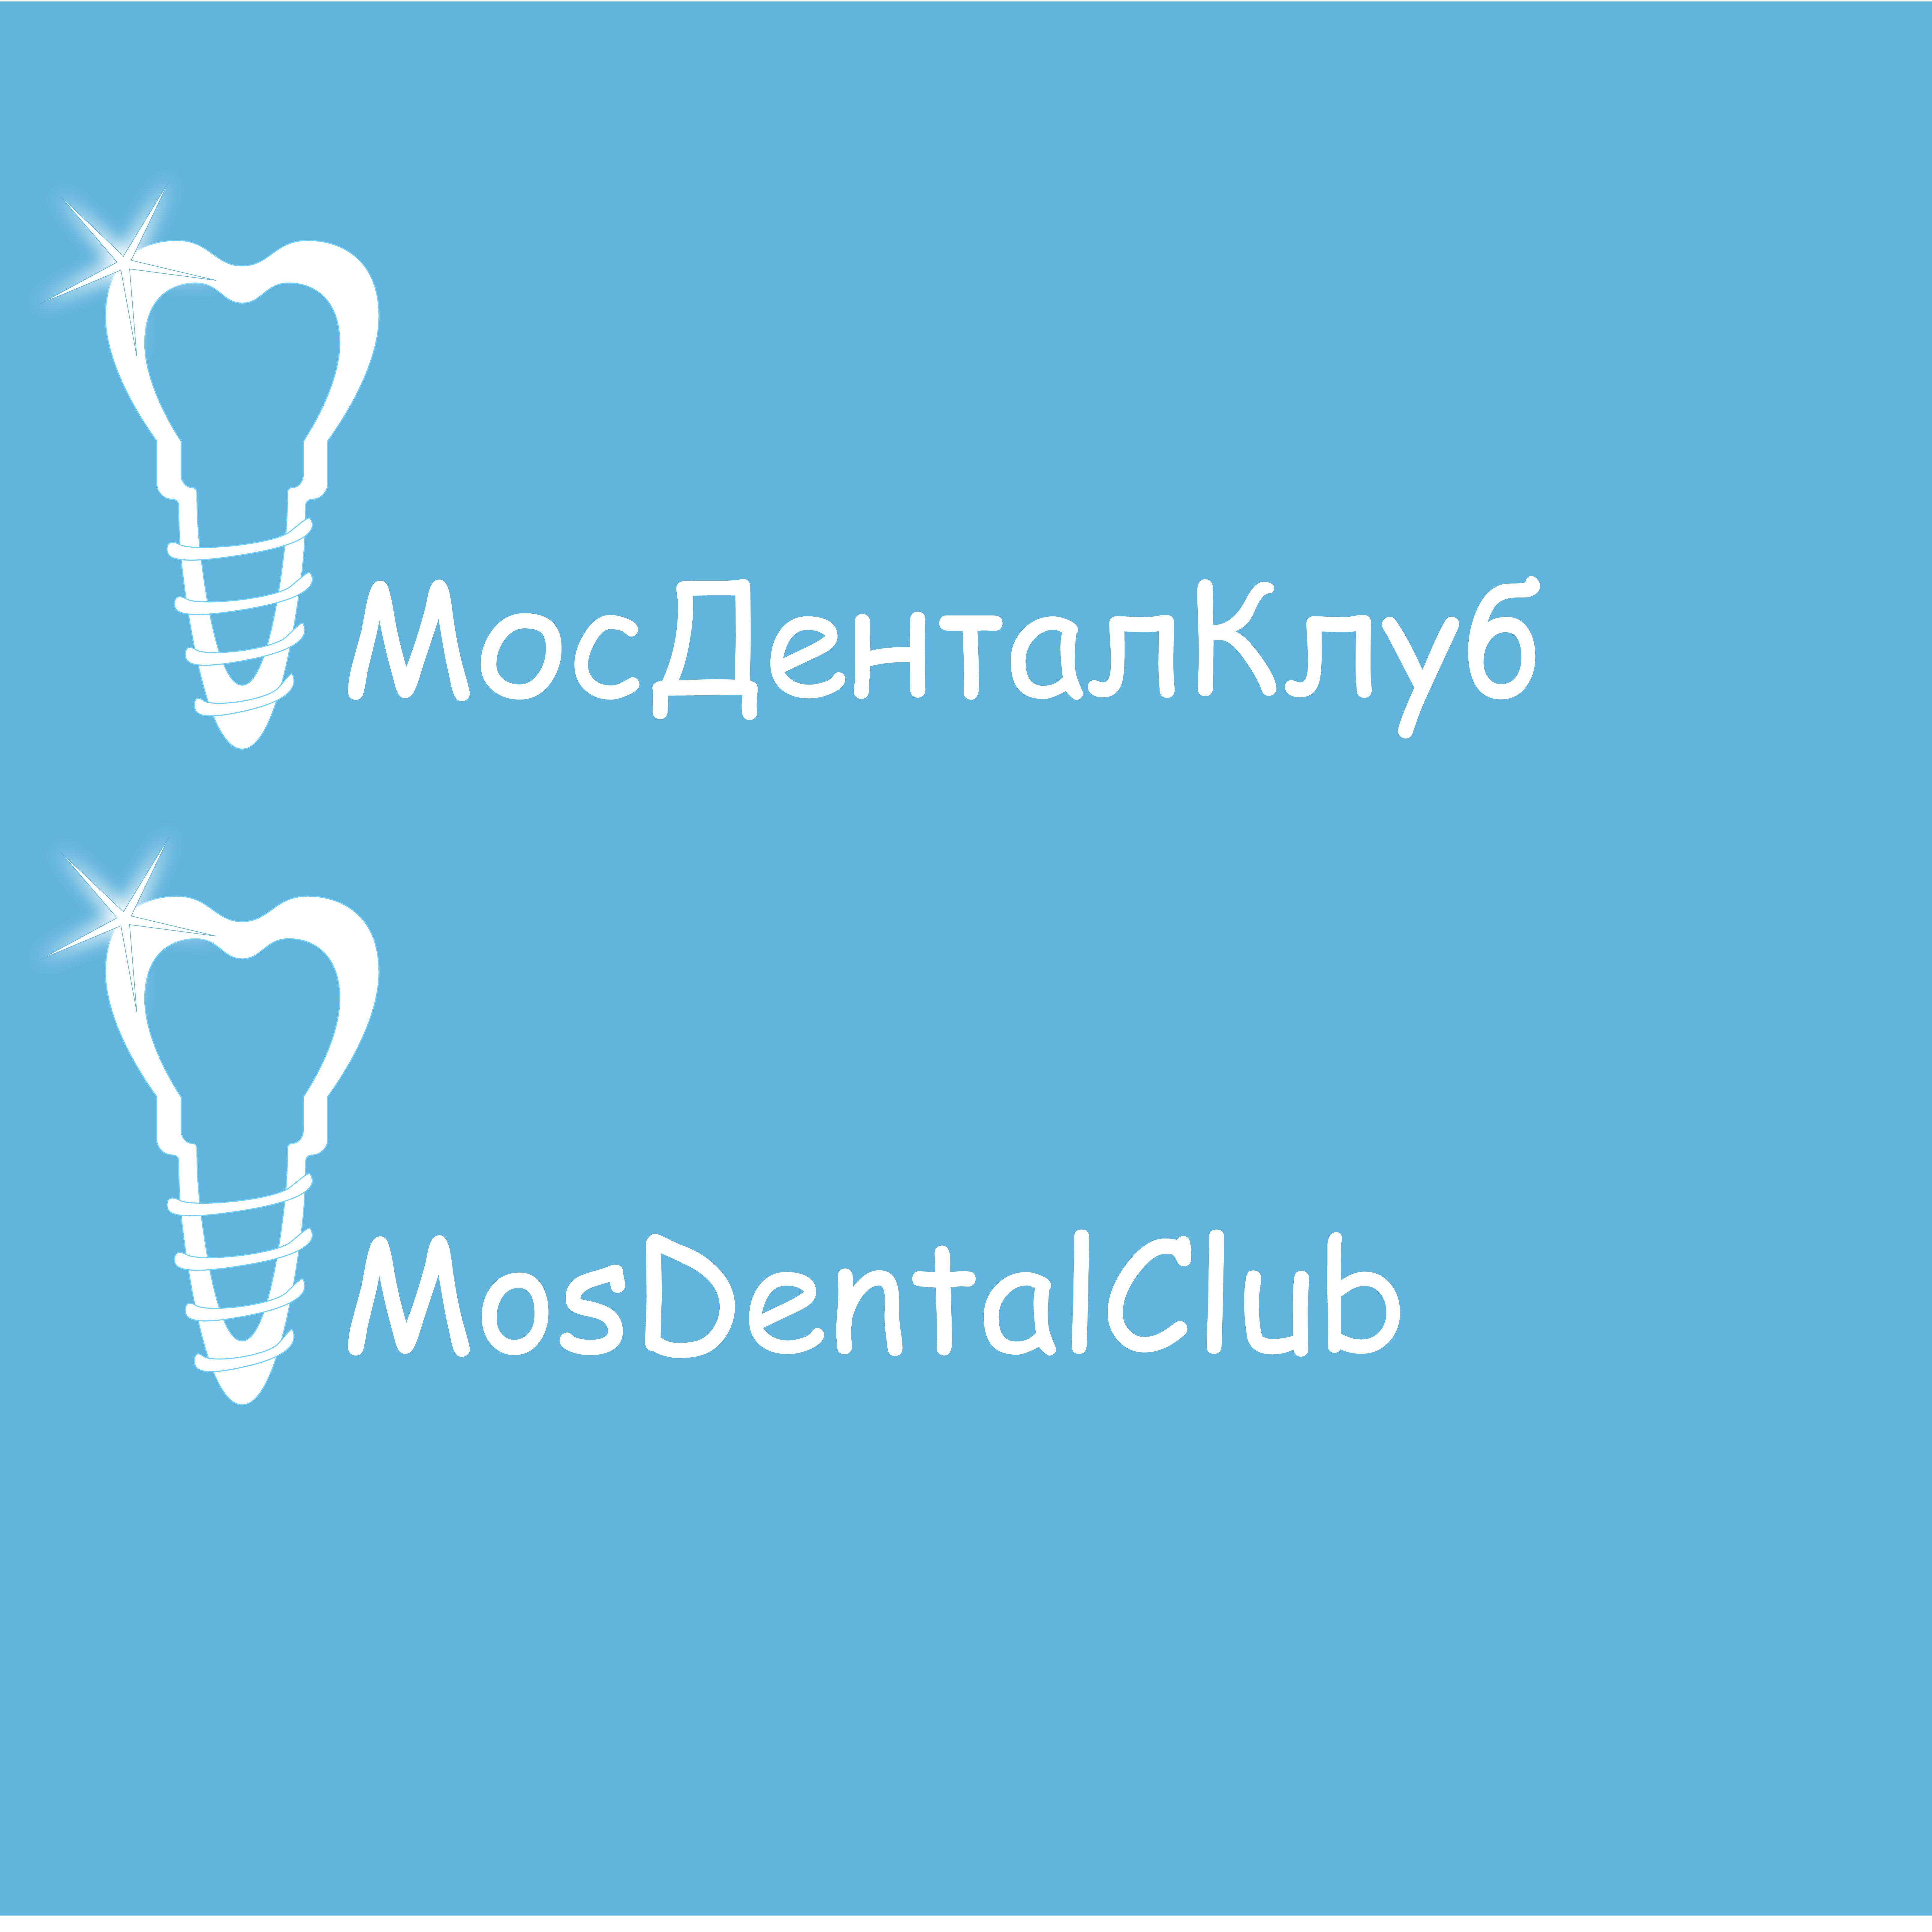 Разработка логотипа стоматологического медицинского центра фото f_7435e47e804b3a69.jpg